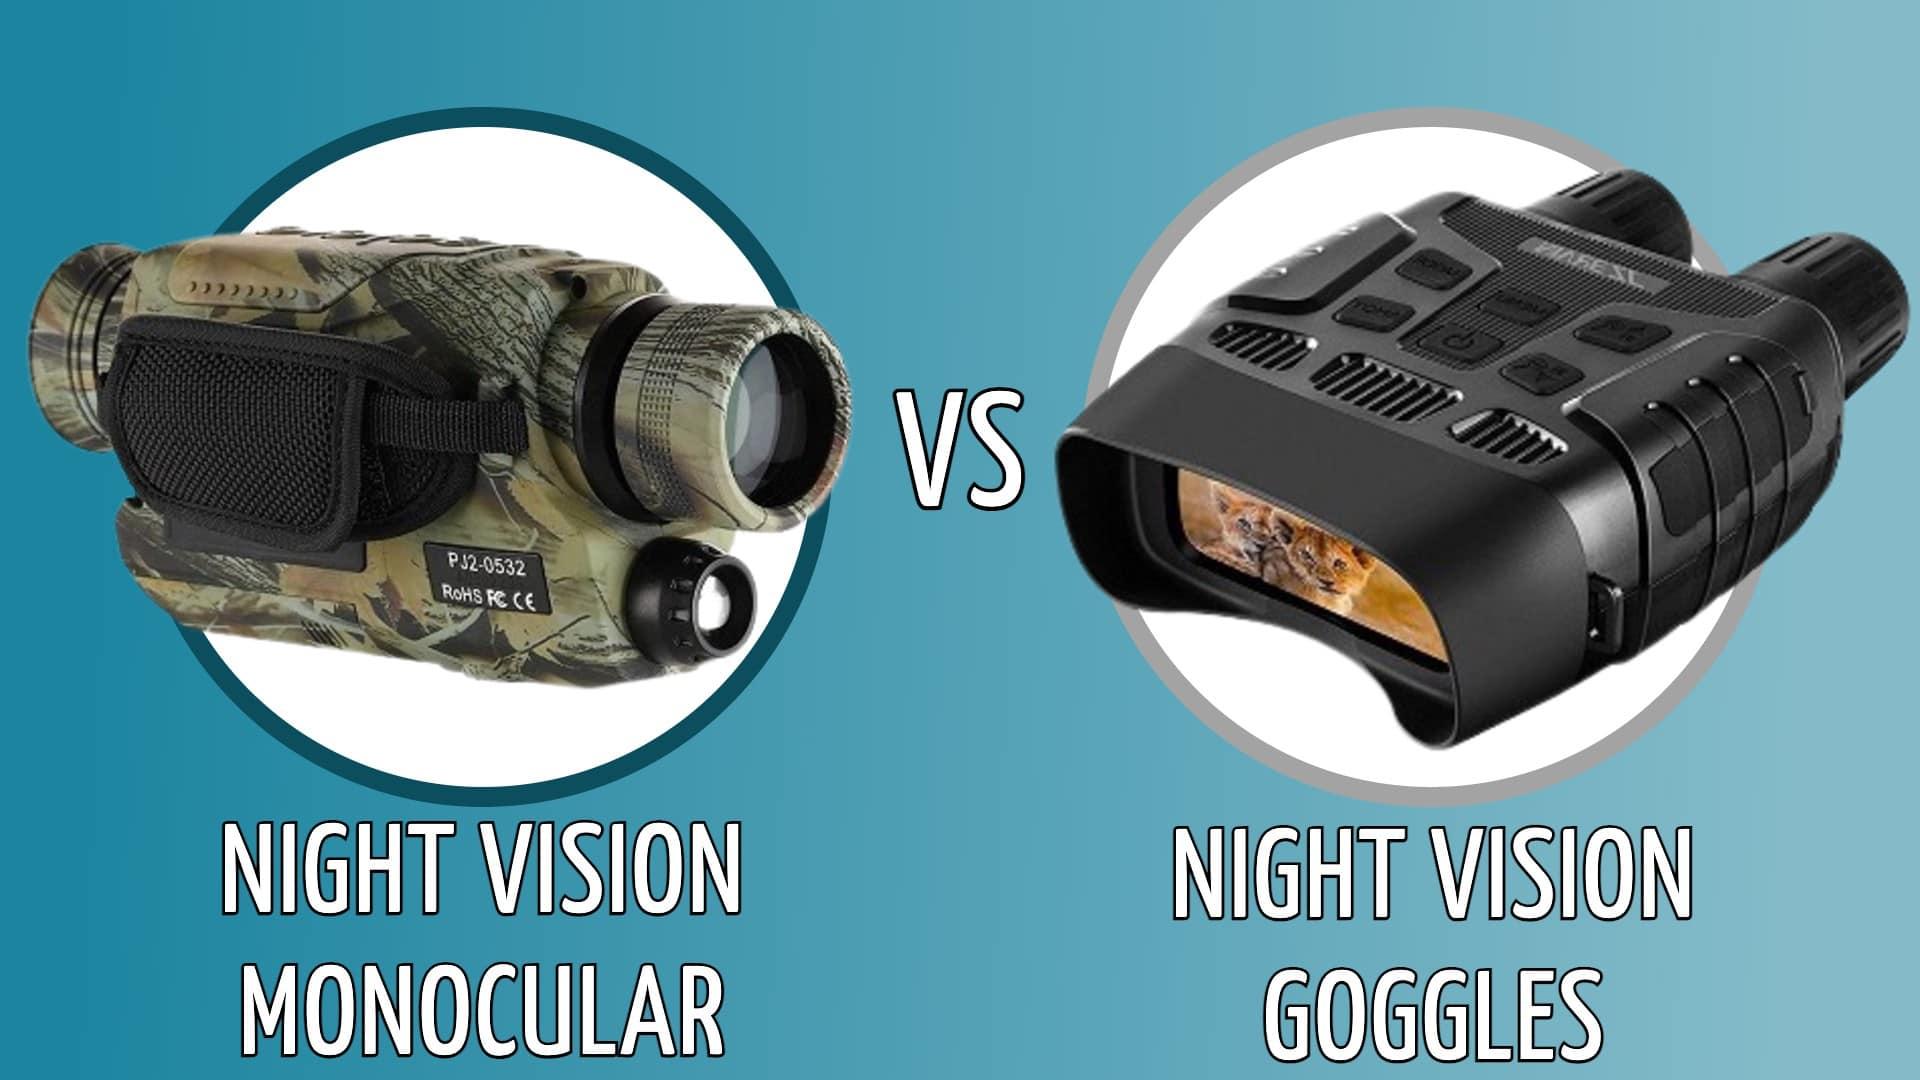 night vision monocular vs goggles